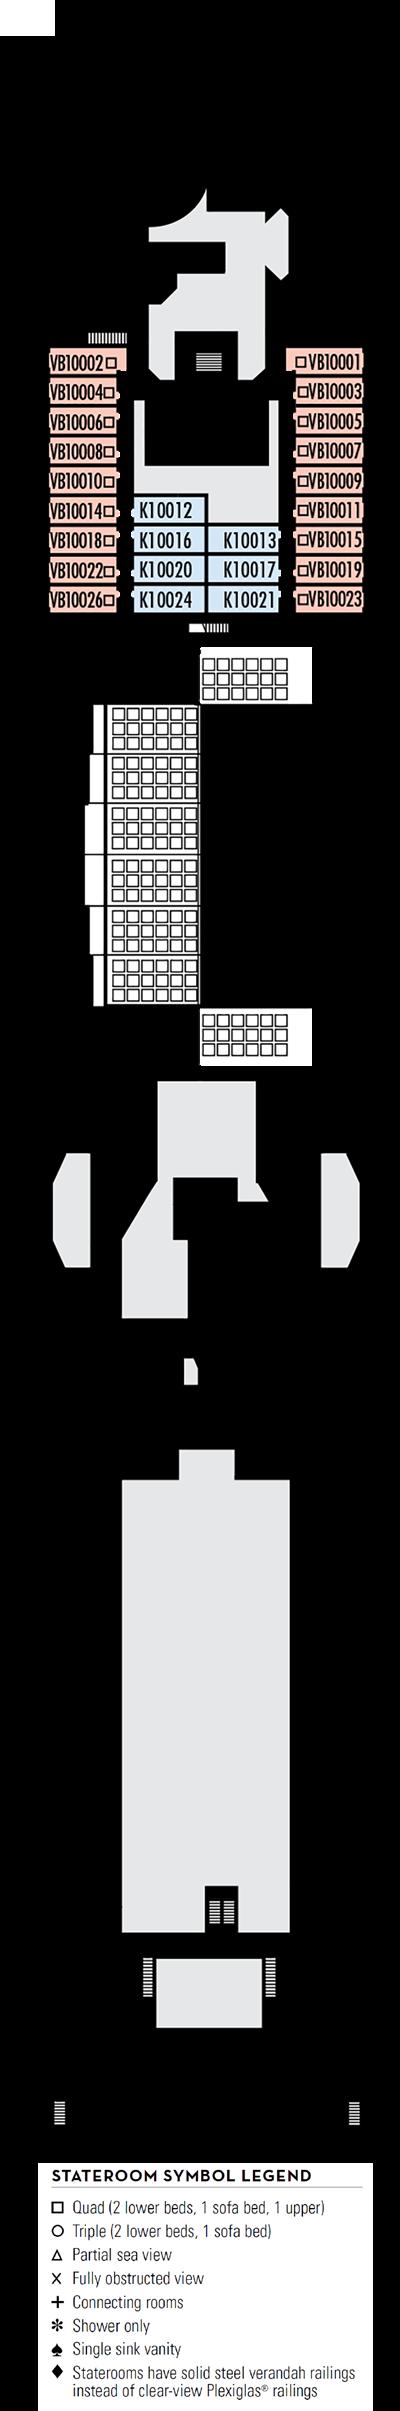 Deck 10 - HAL's Oosterdam